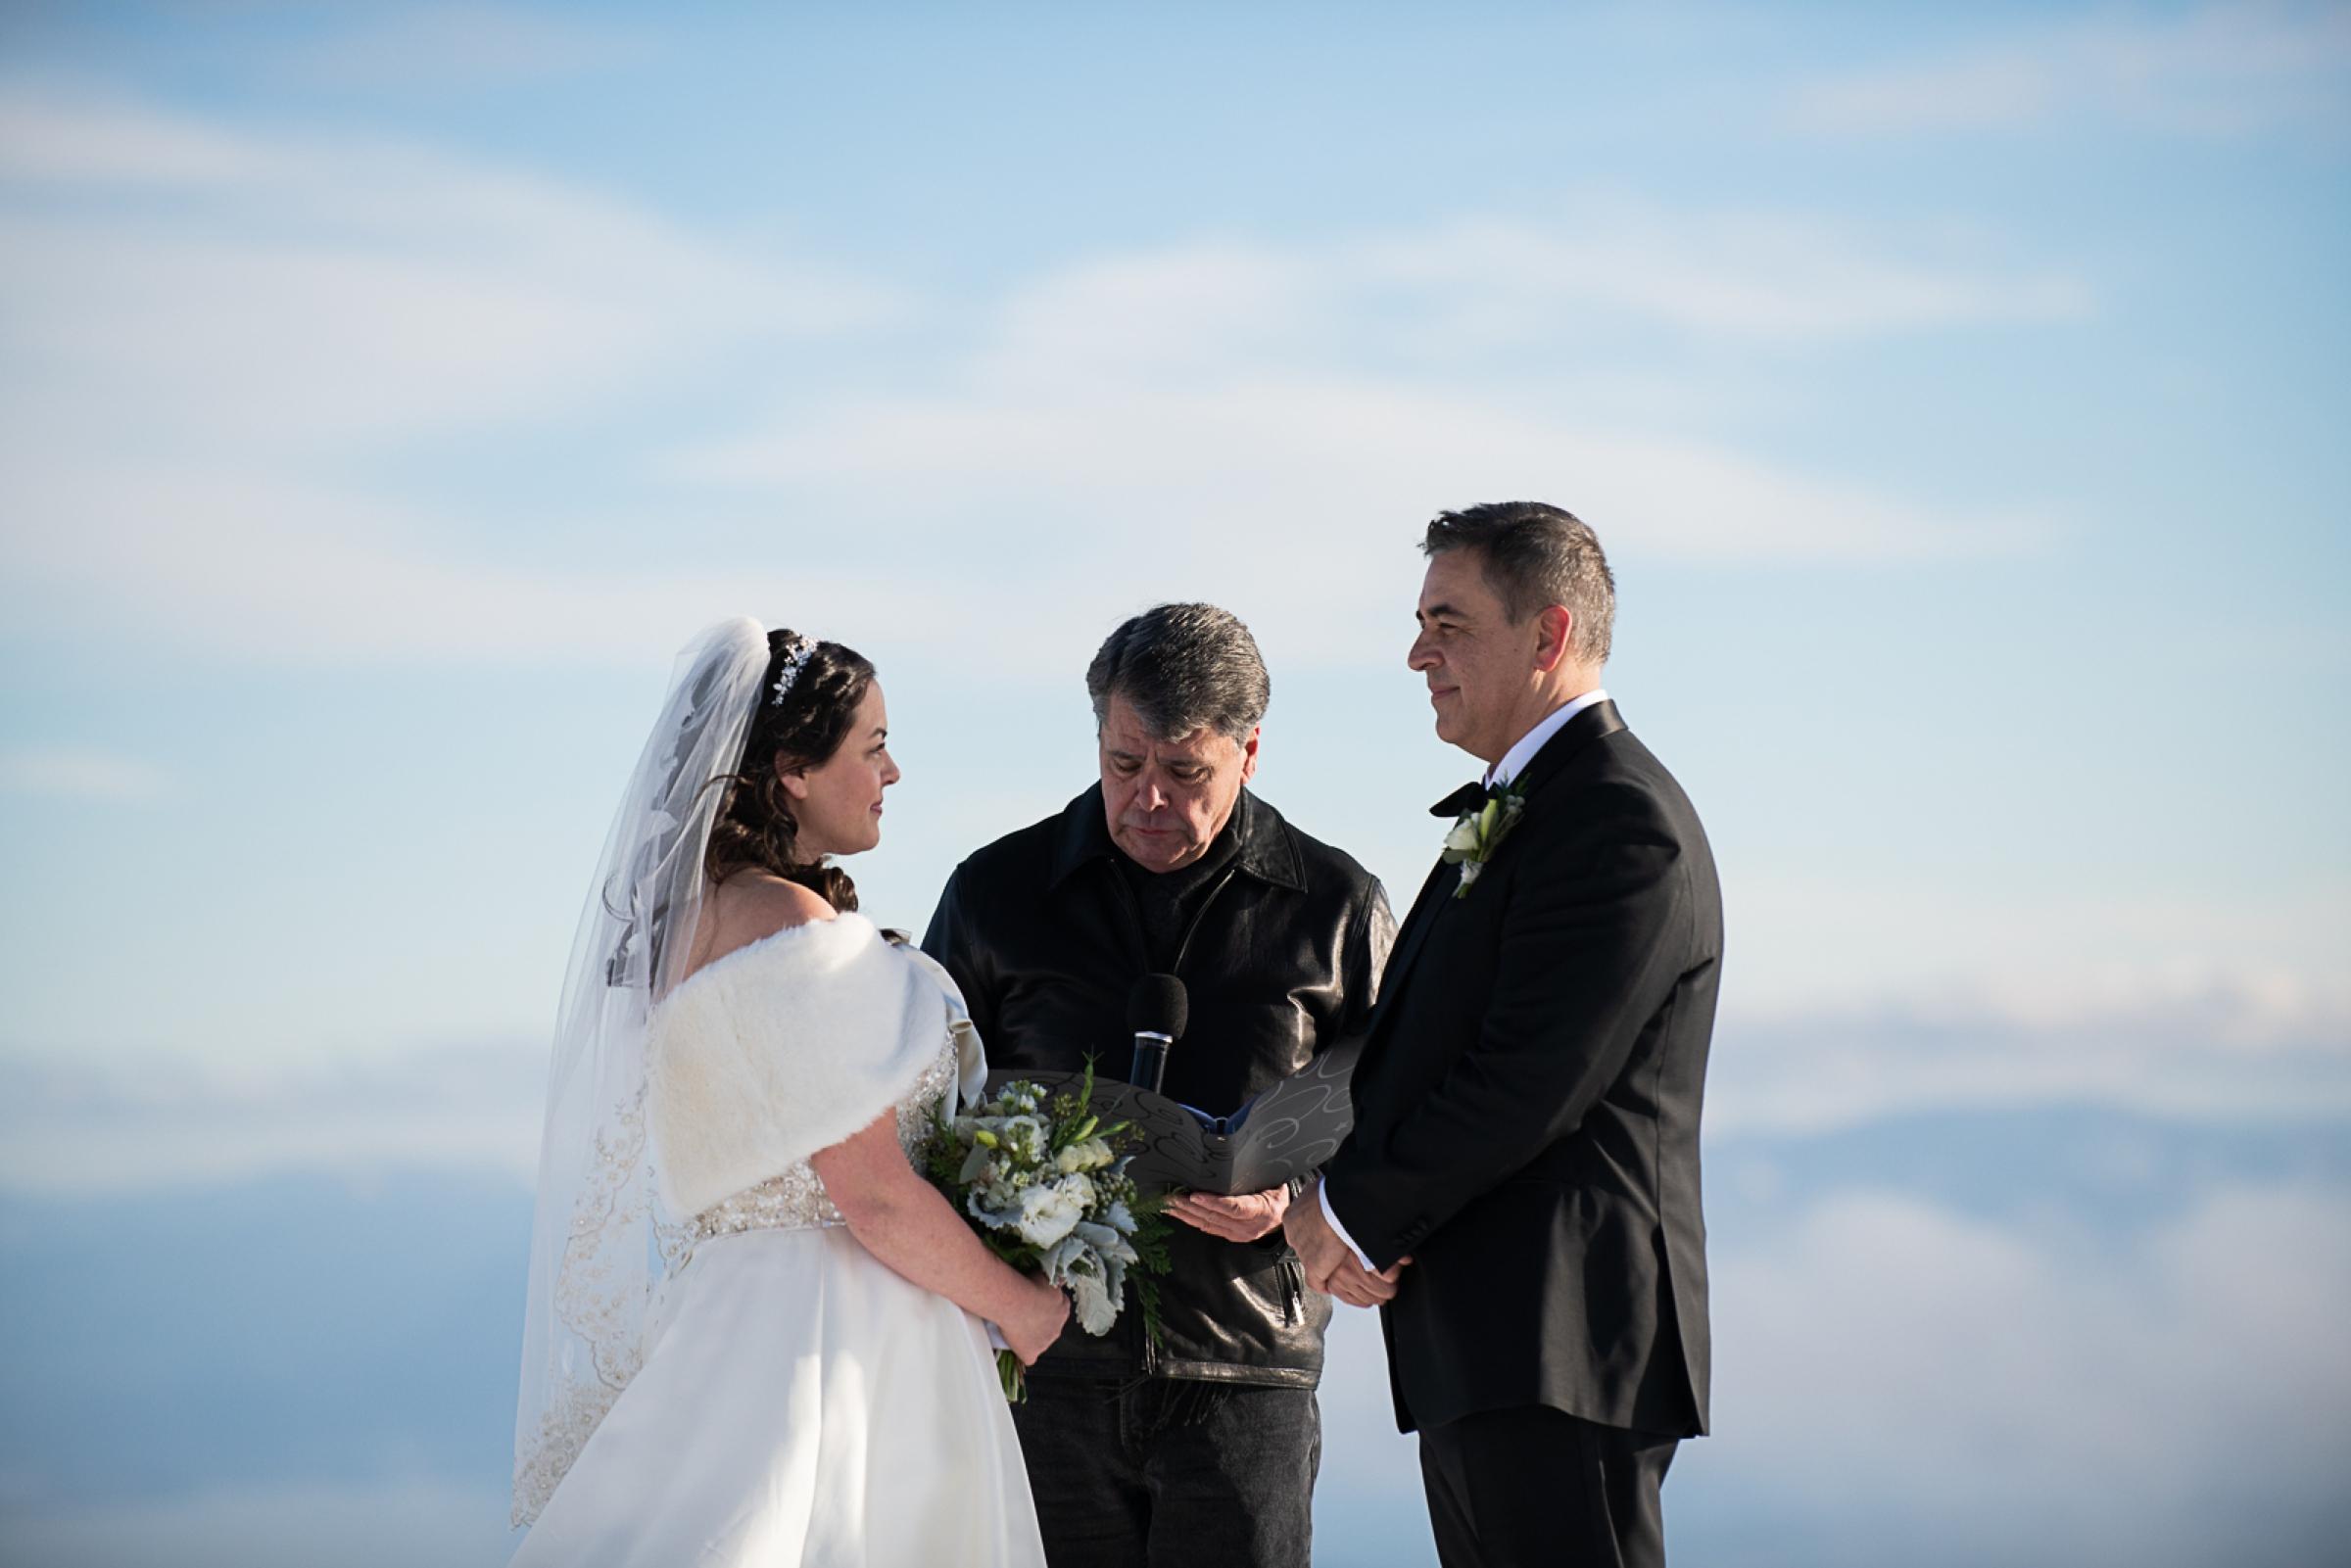 Janel-Gion-Wedding-Photographer-KristinRon-Sandpoint-Idaho.jpg_0008.jpg